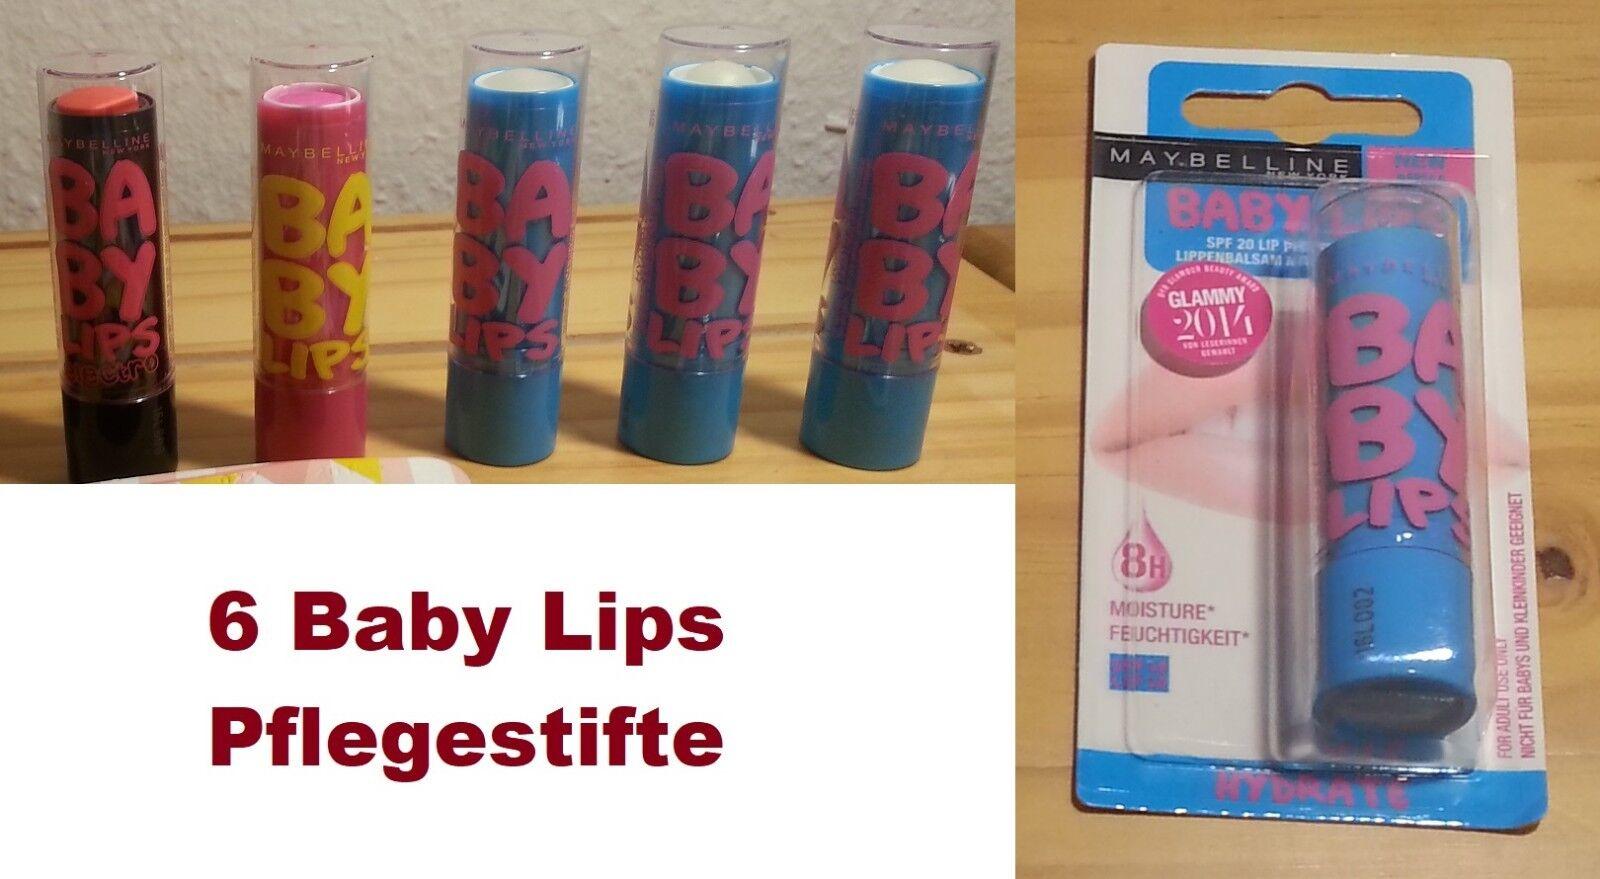 Lippenbalsam Baby Lips Hydrate Electro Pink Punch Set Sammlung Lippenpflege